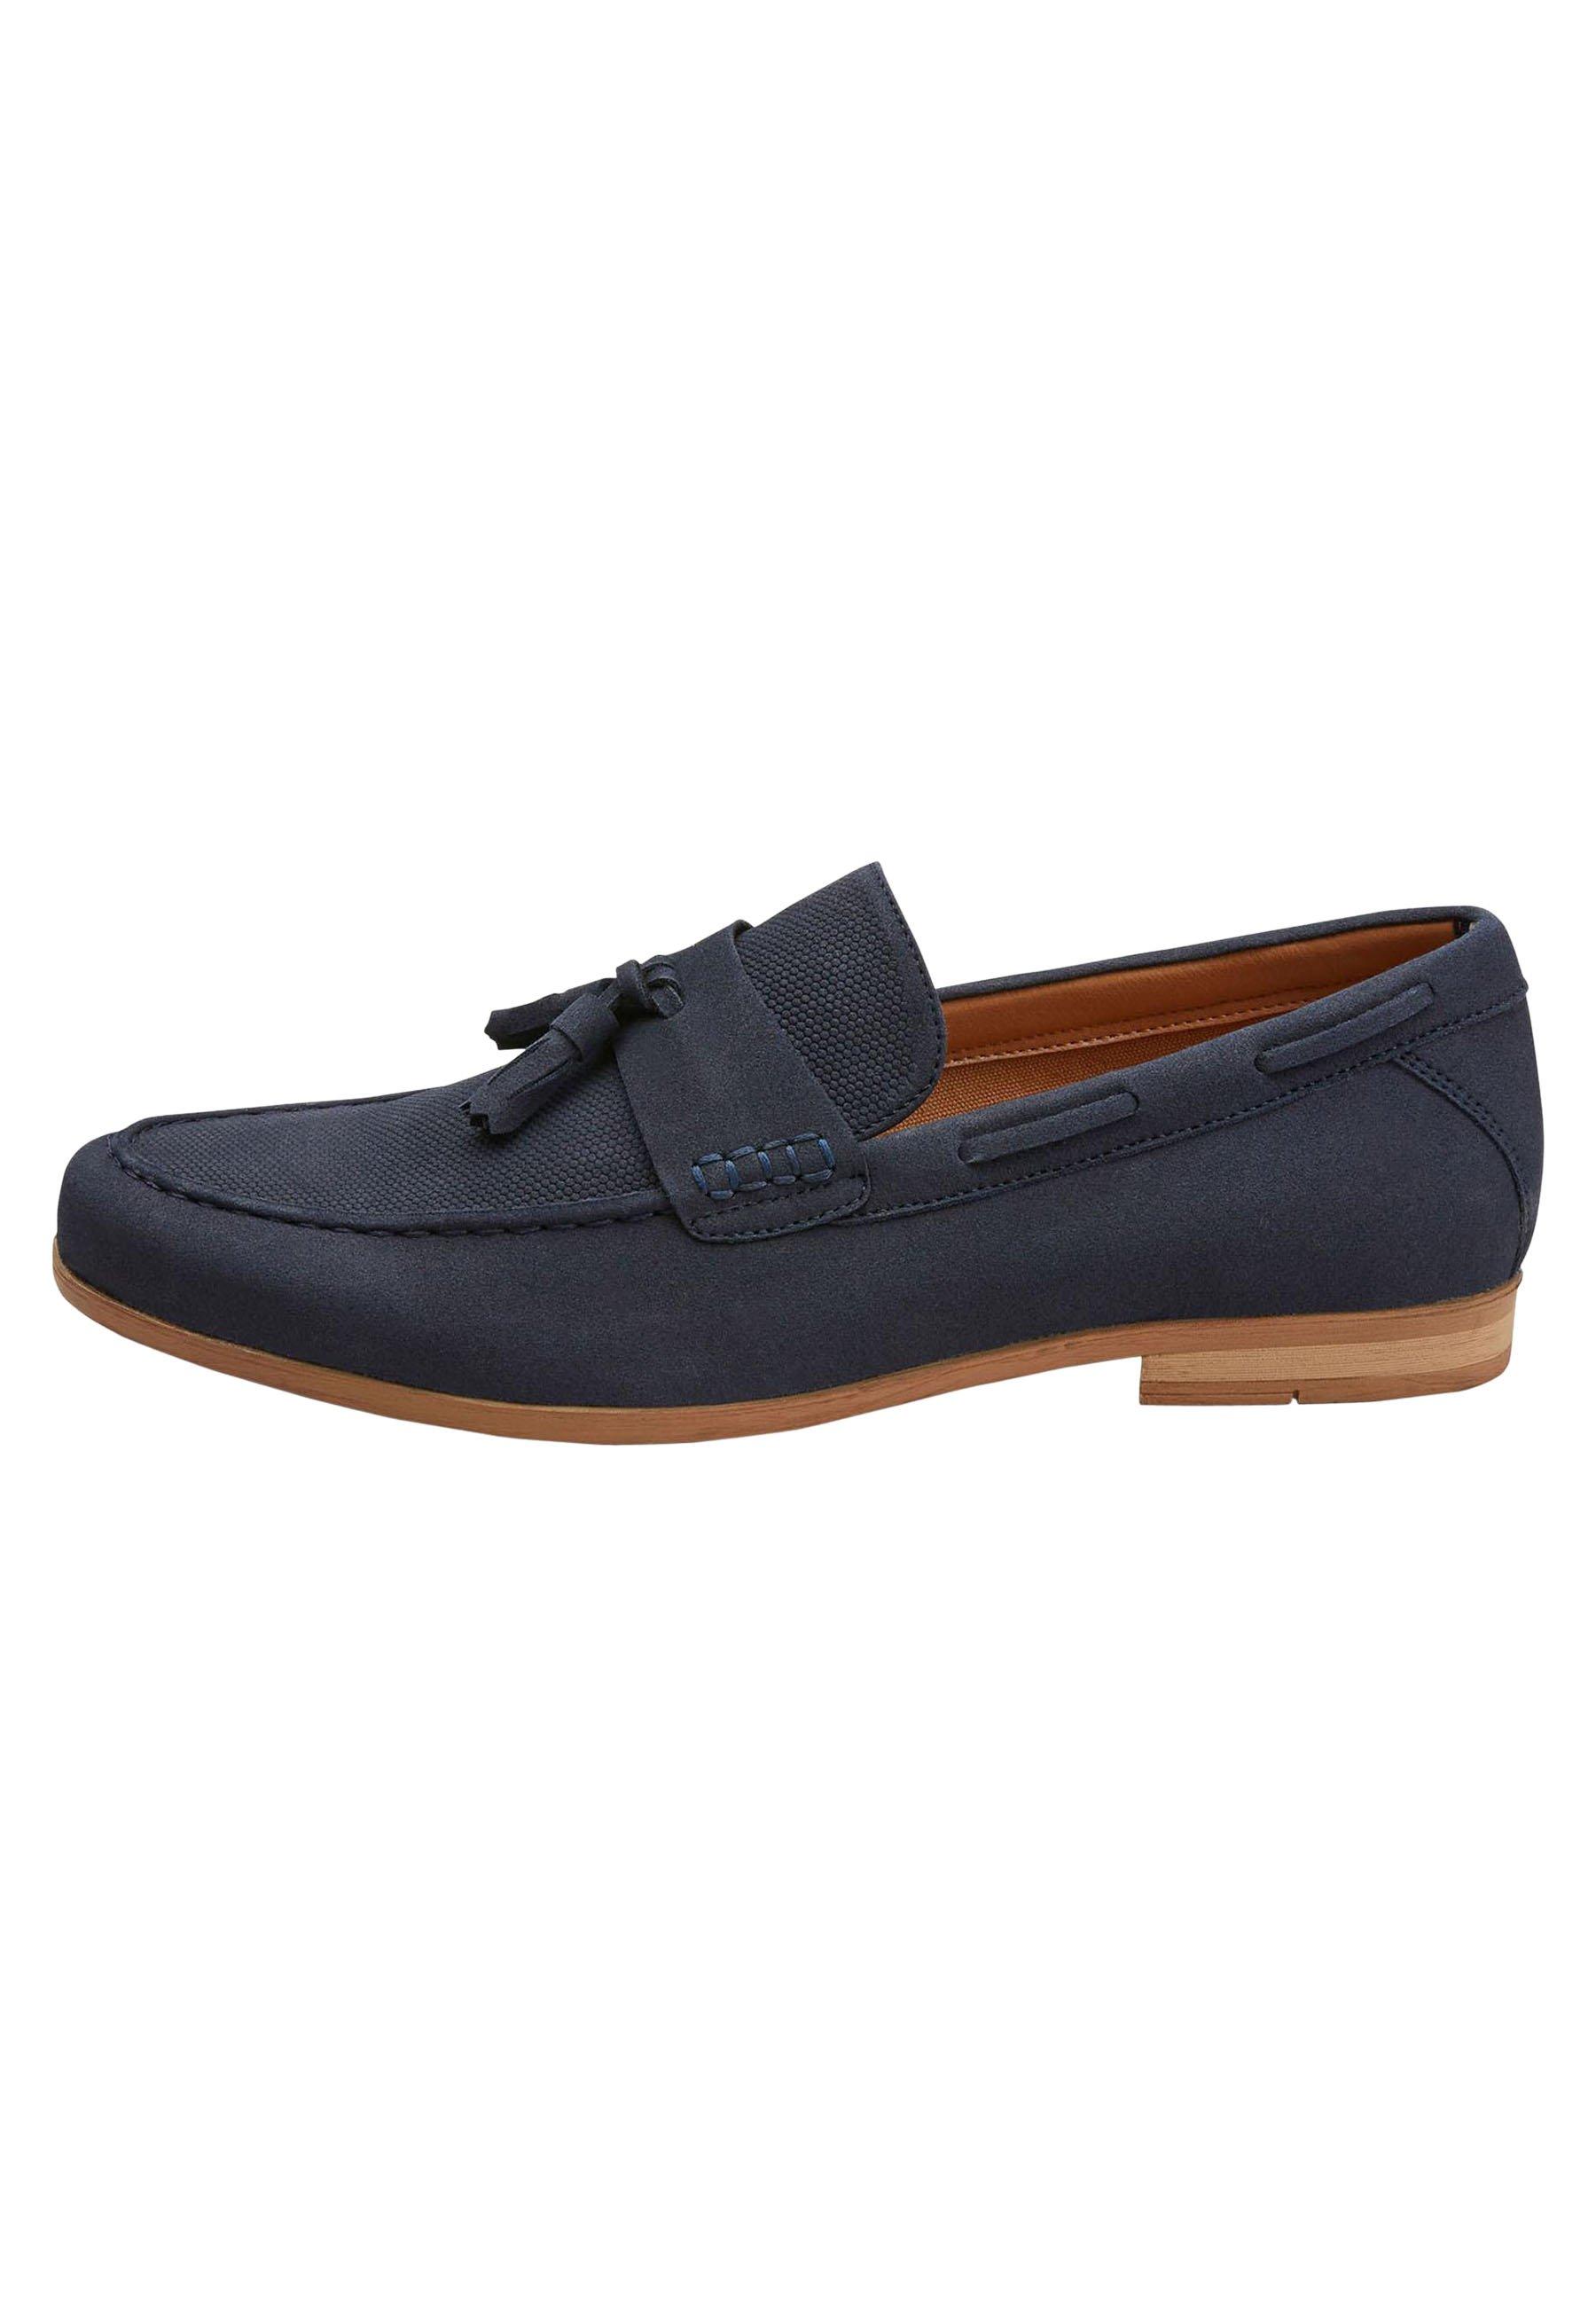 Herrer Loafers